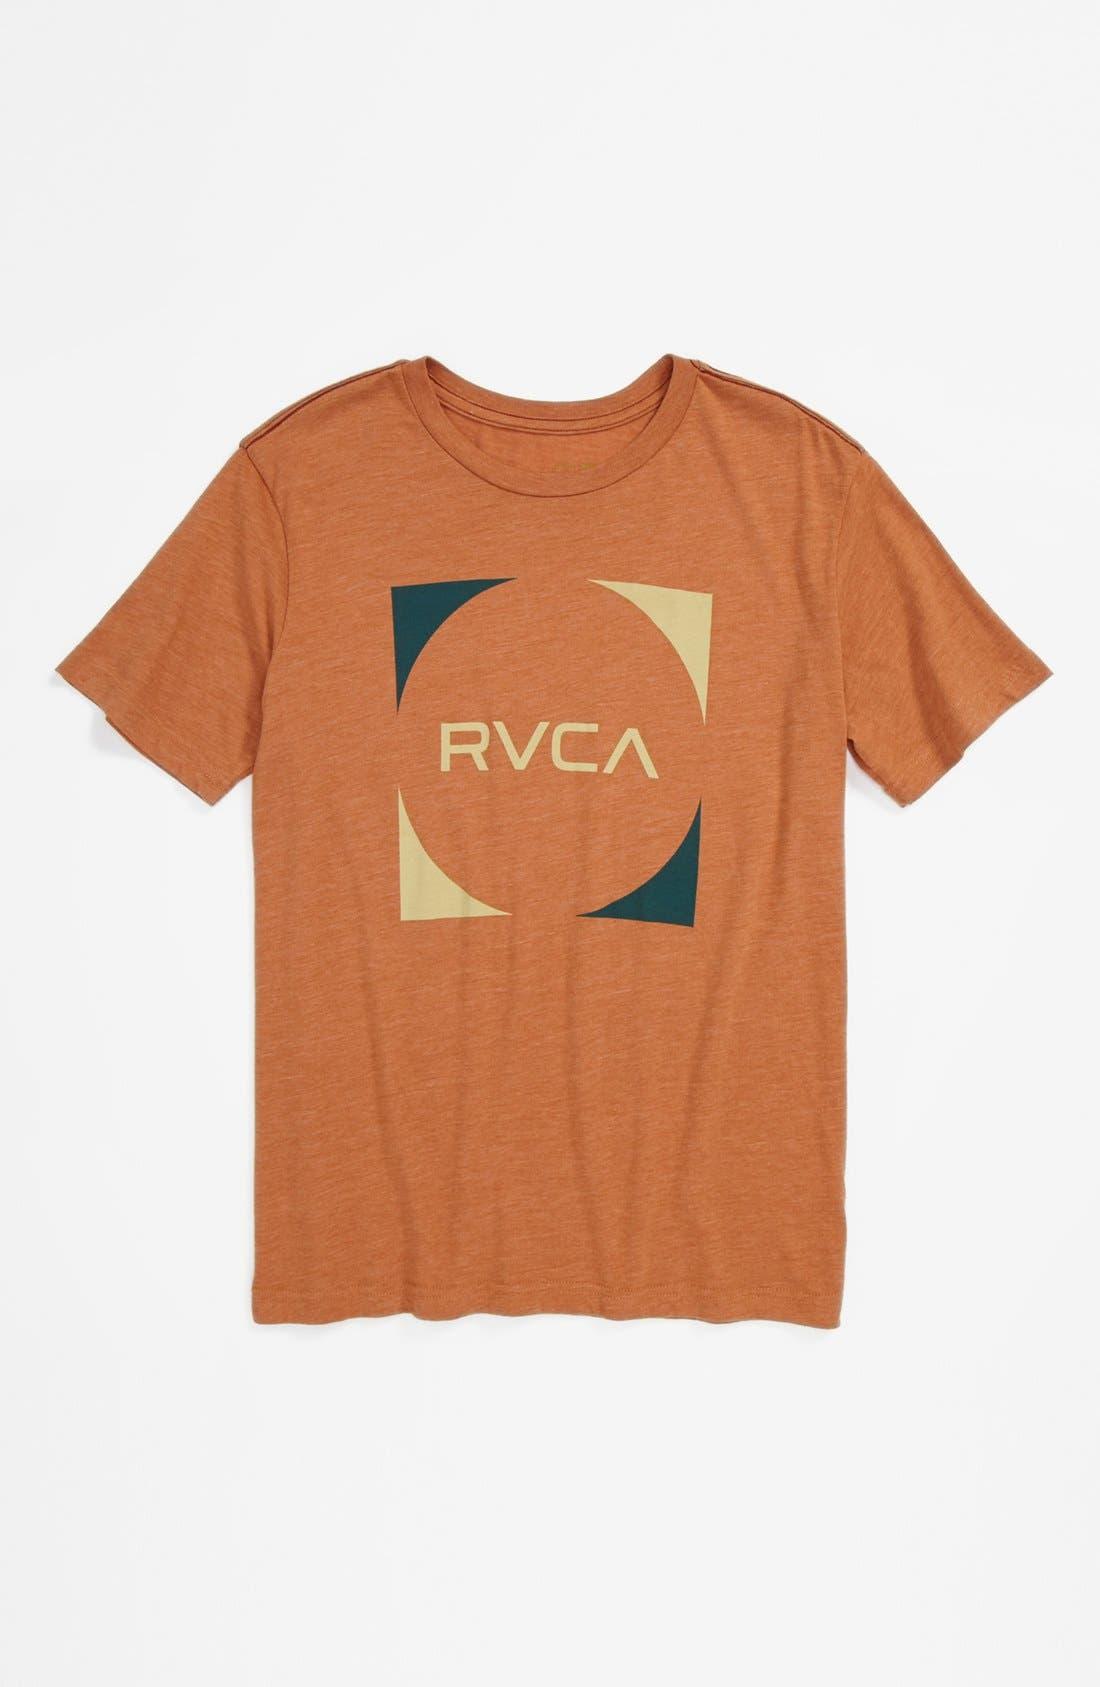 Main Image - RVCA 'Baller' T-Shirt (Big Boys)